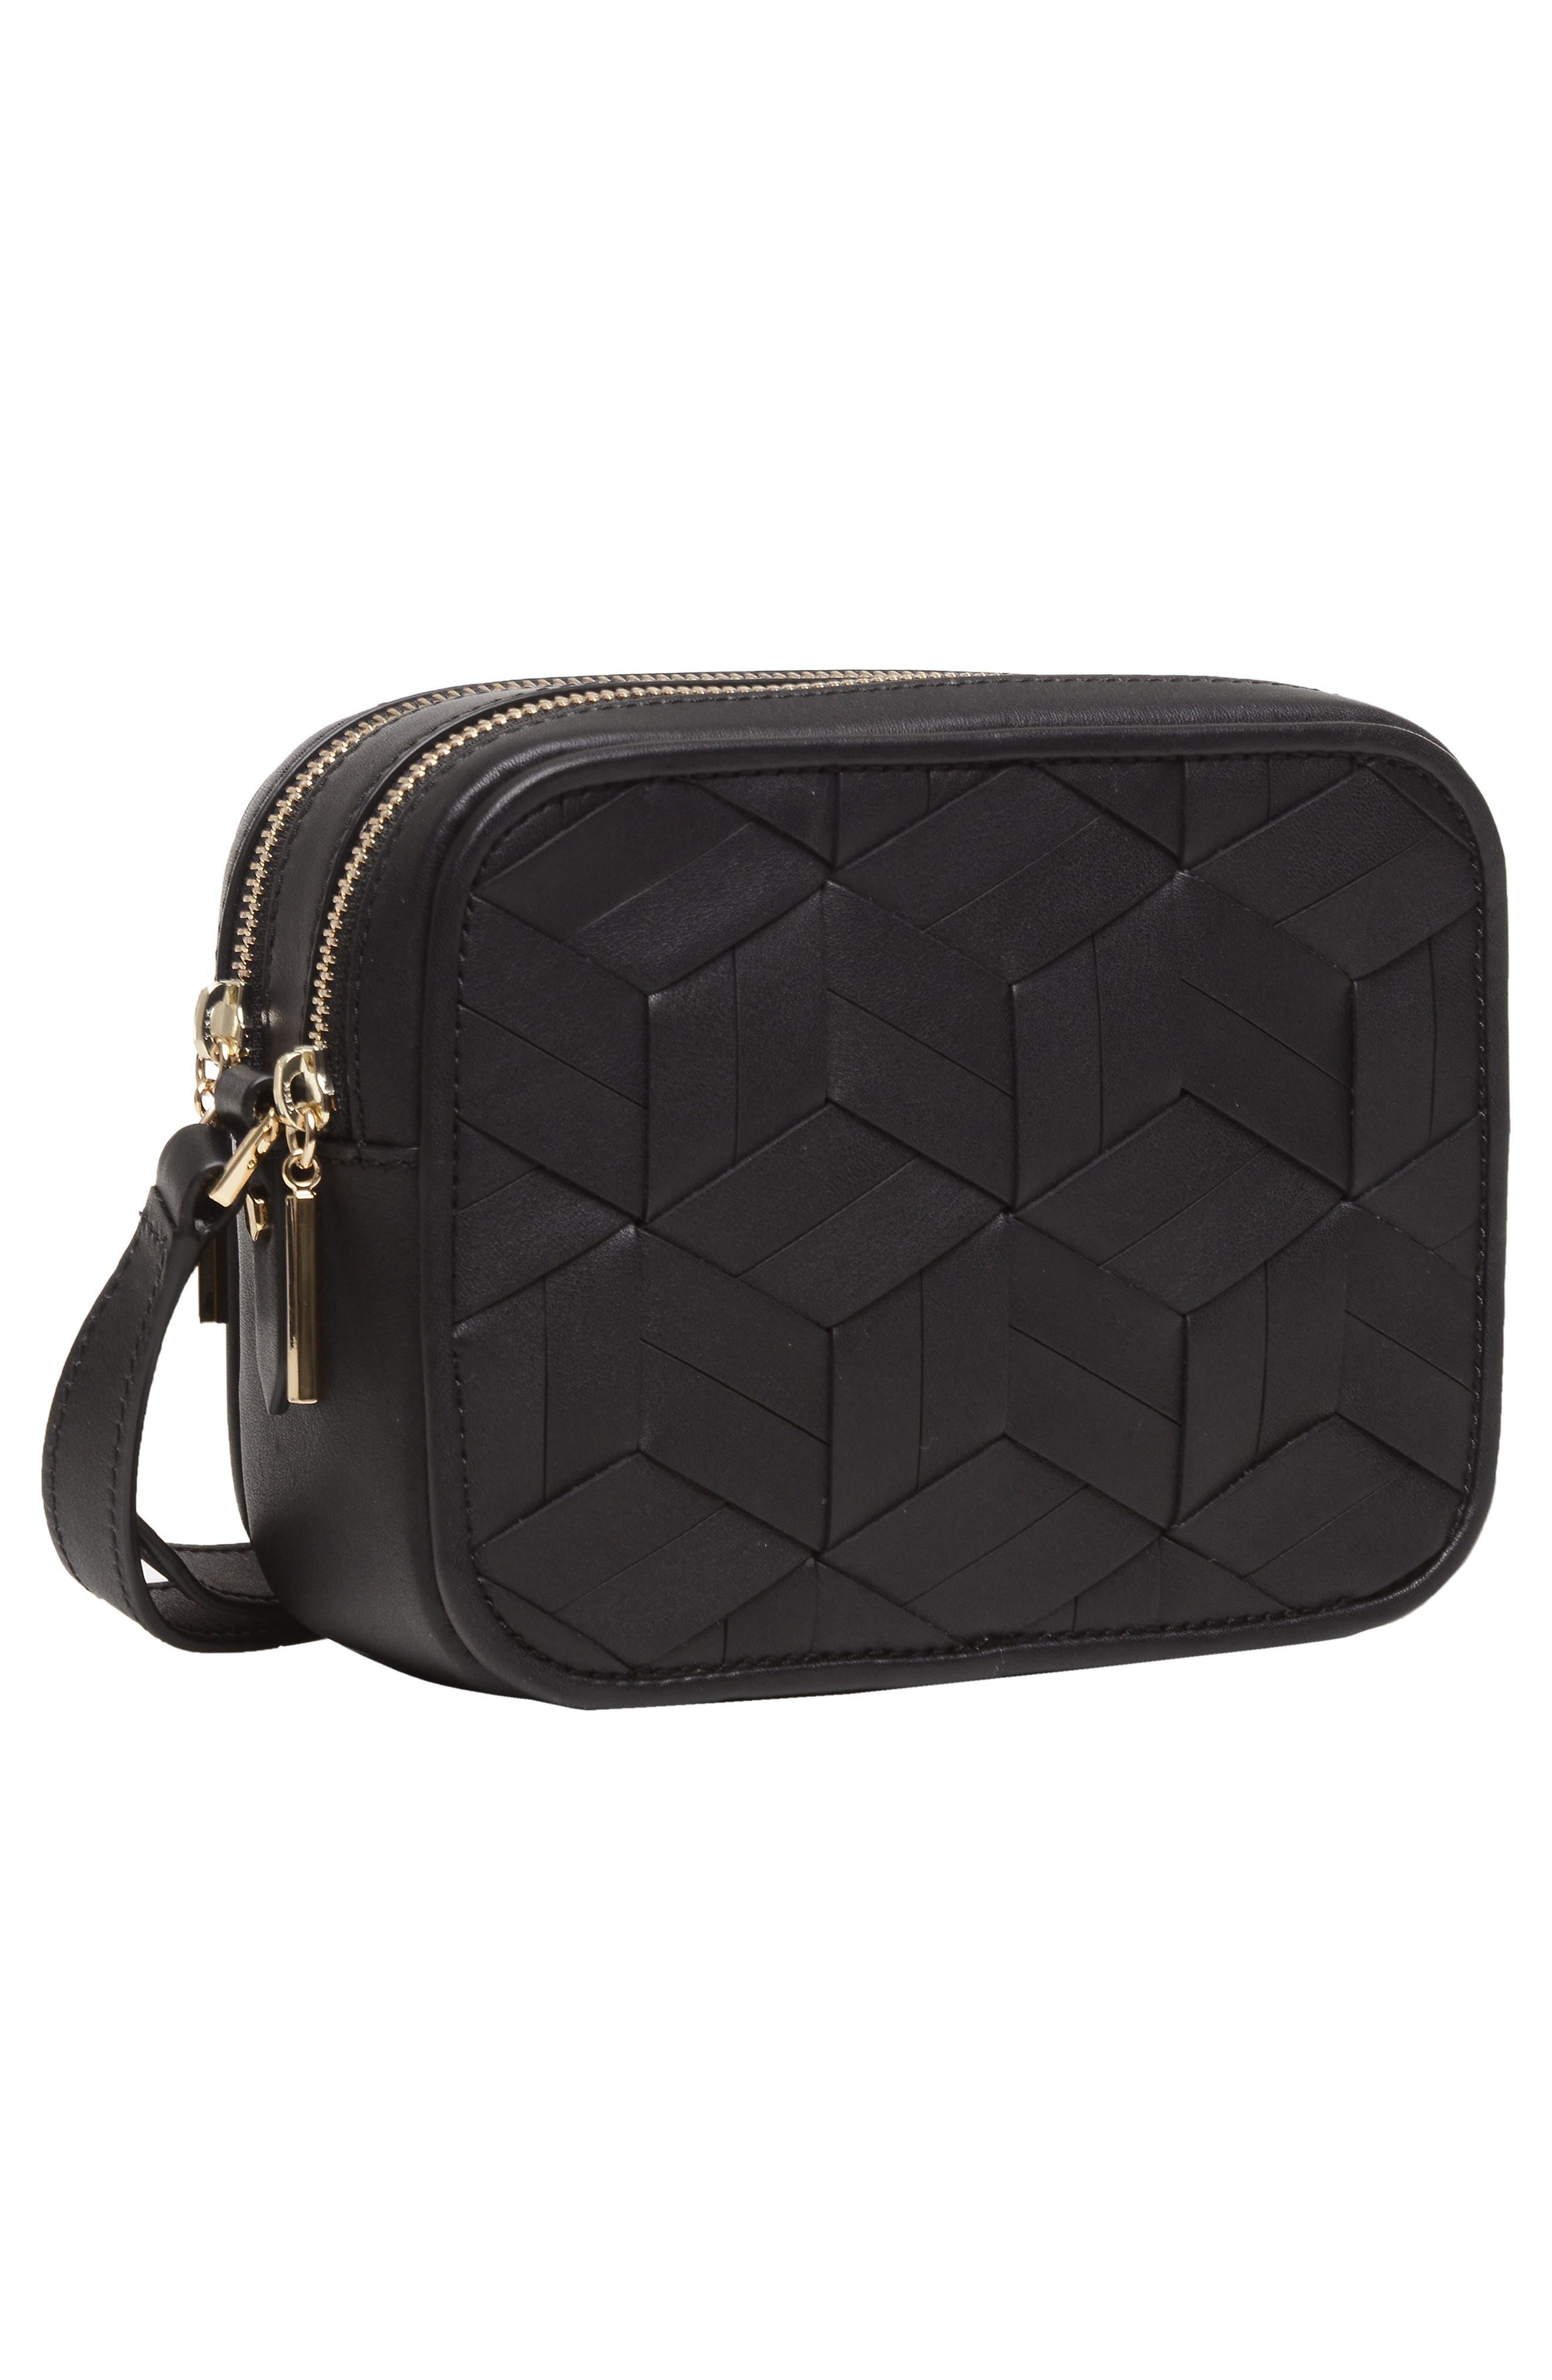 Explorer Woven Leather Camera Bag,                             Alternate thumbnail 4, color,                             Black